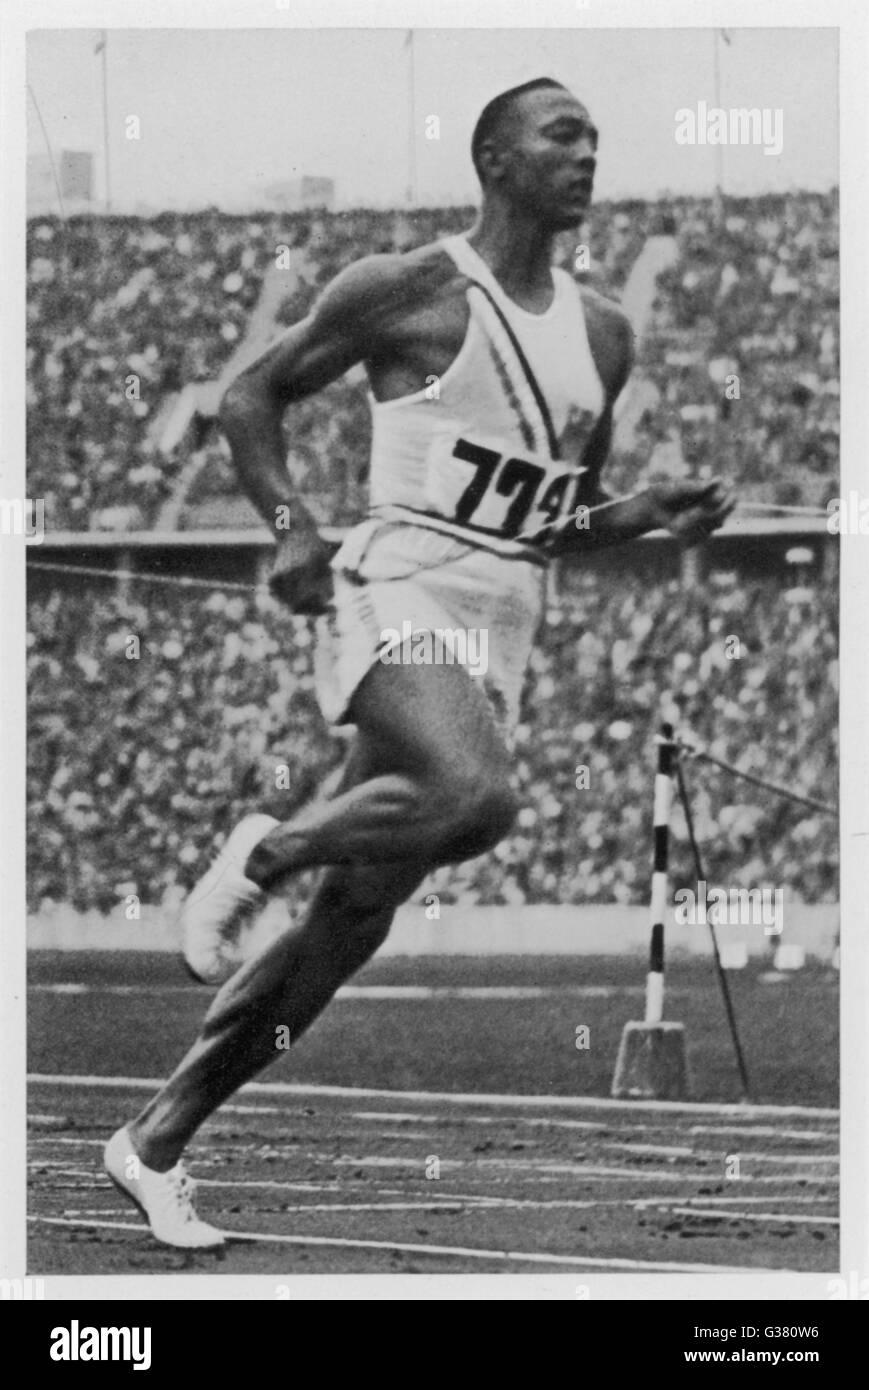 JESSE OWENS  Jesse Owens breaks the  100 metre record       Date: 1936 - Stock Image